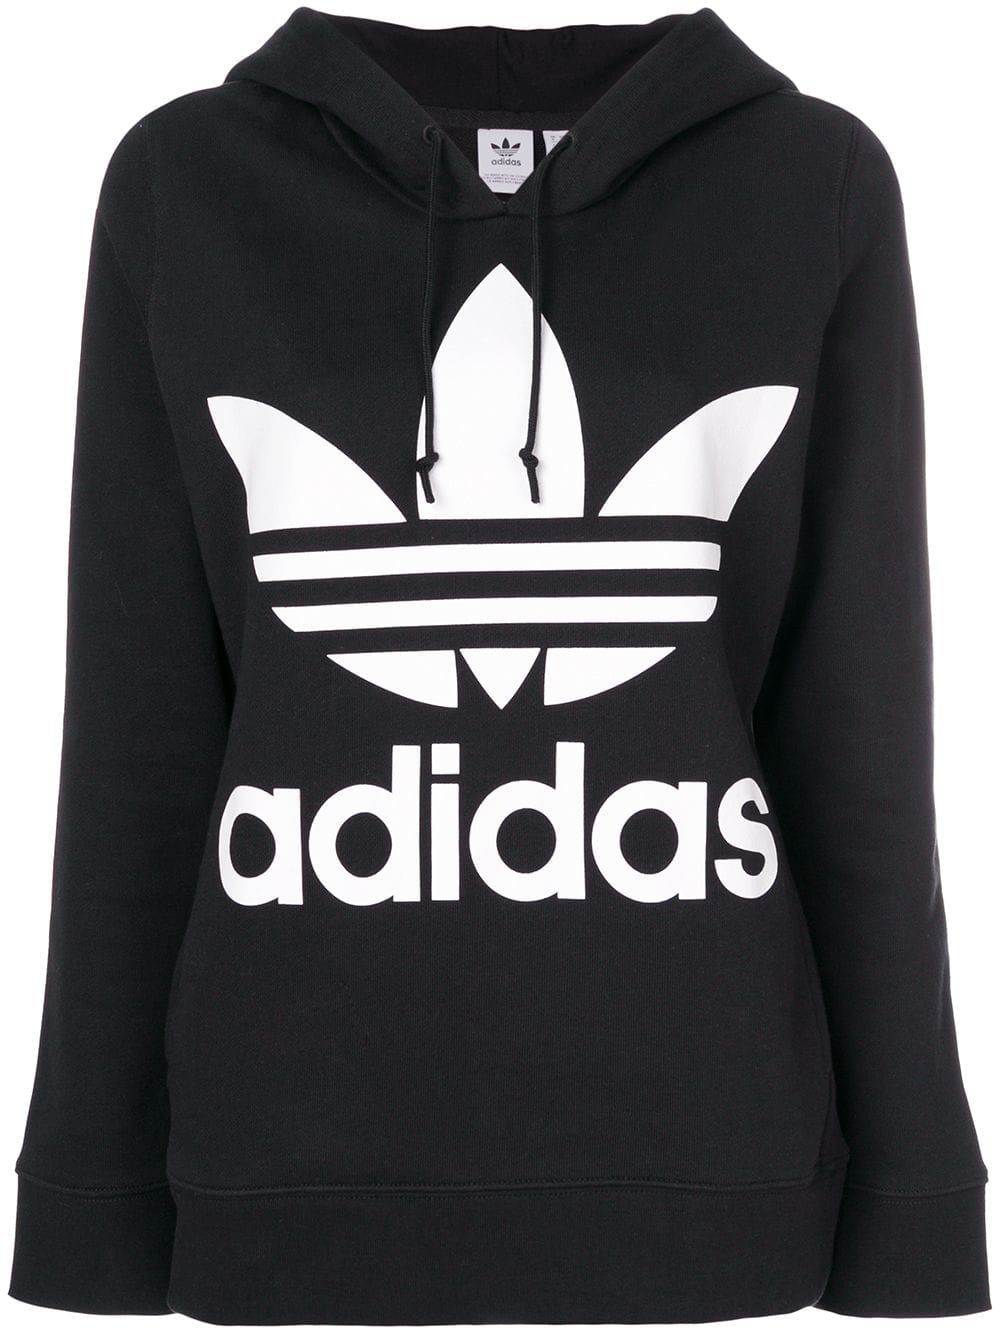 4c133f6ff Adidas Adidas Originals Trefoil hoodie - Black in 2019 | Products ...